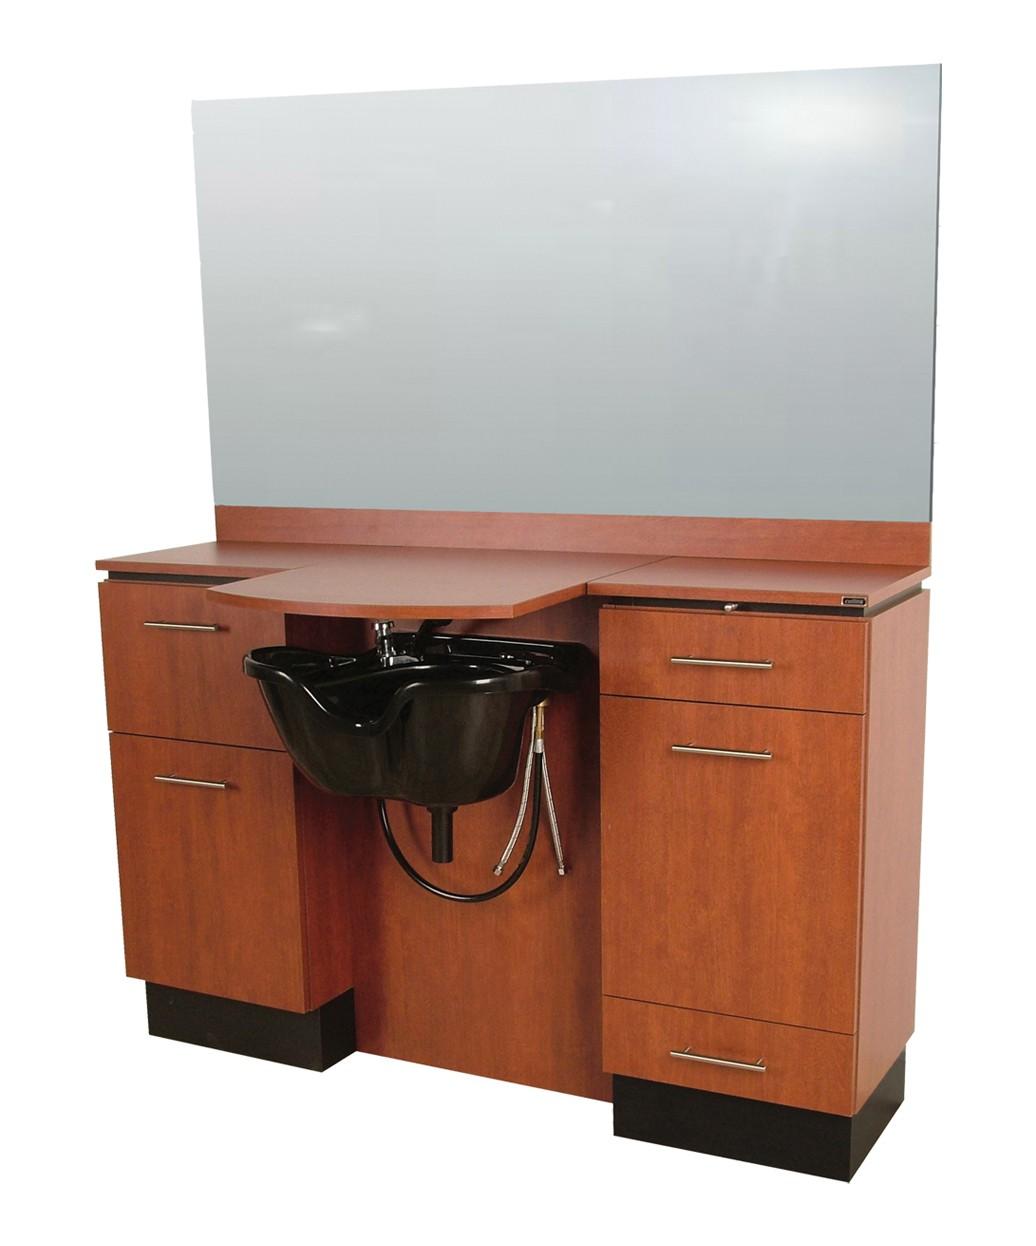 Cherry File Cabinet Collins Qse 4422 60 Neo Michigan Wet Booth Unit